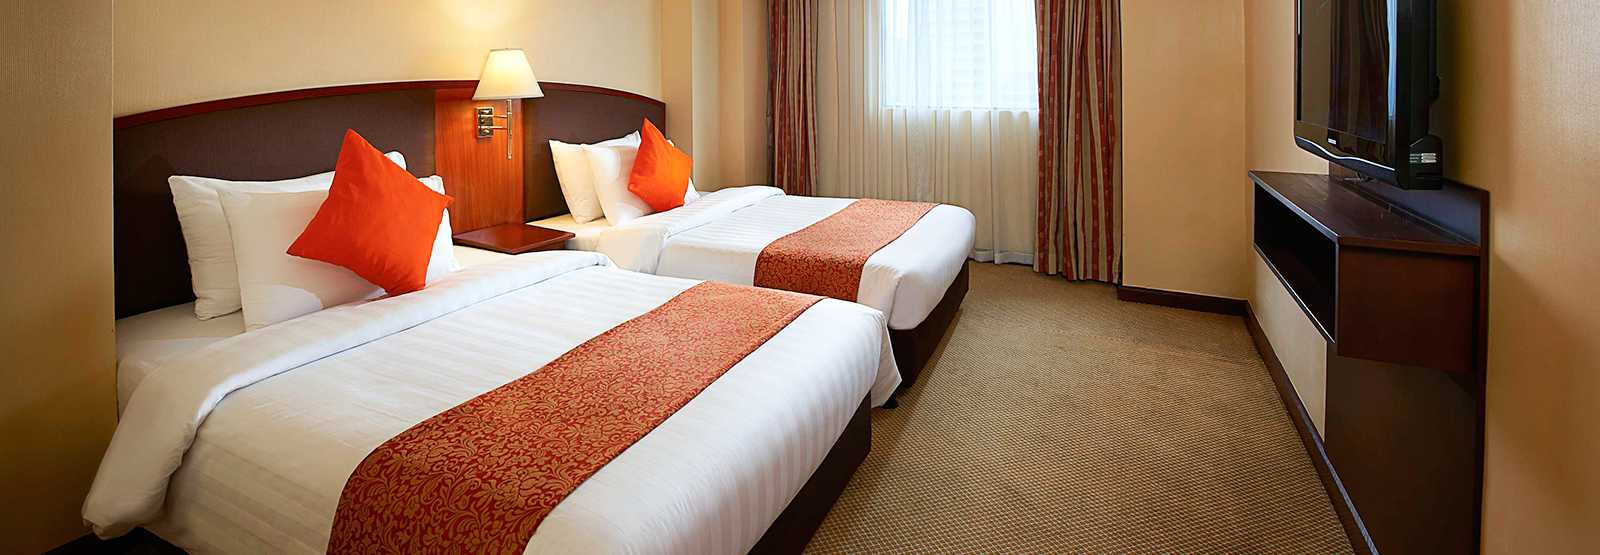 Berjaya Hotels U0026 Resorts